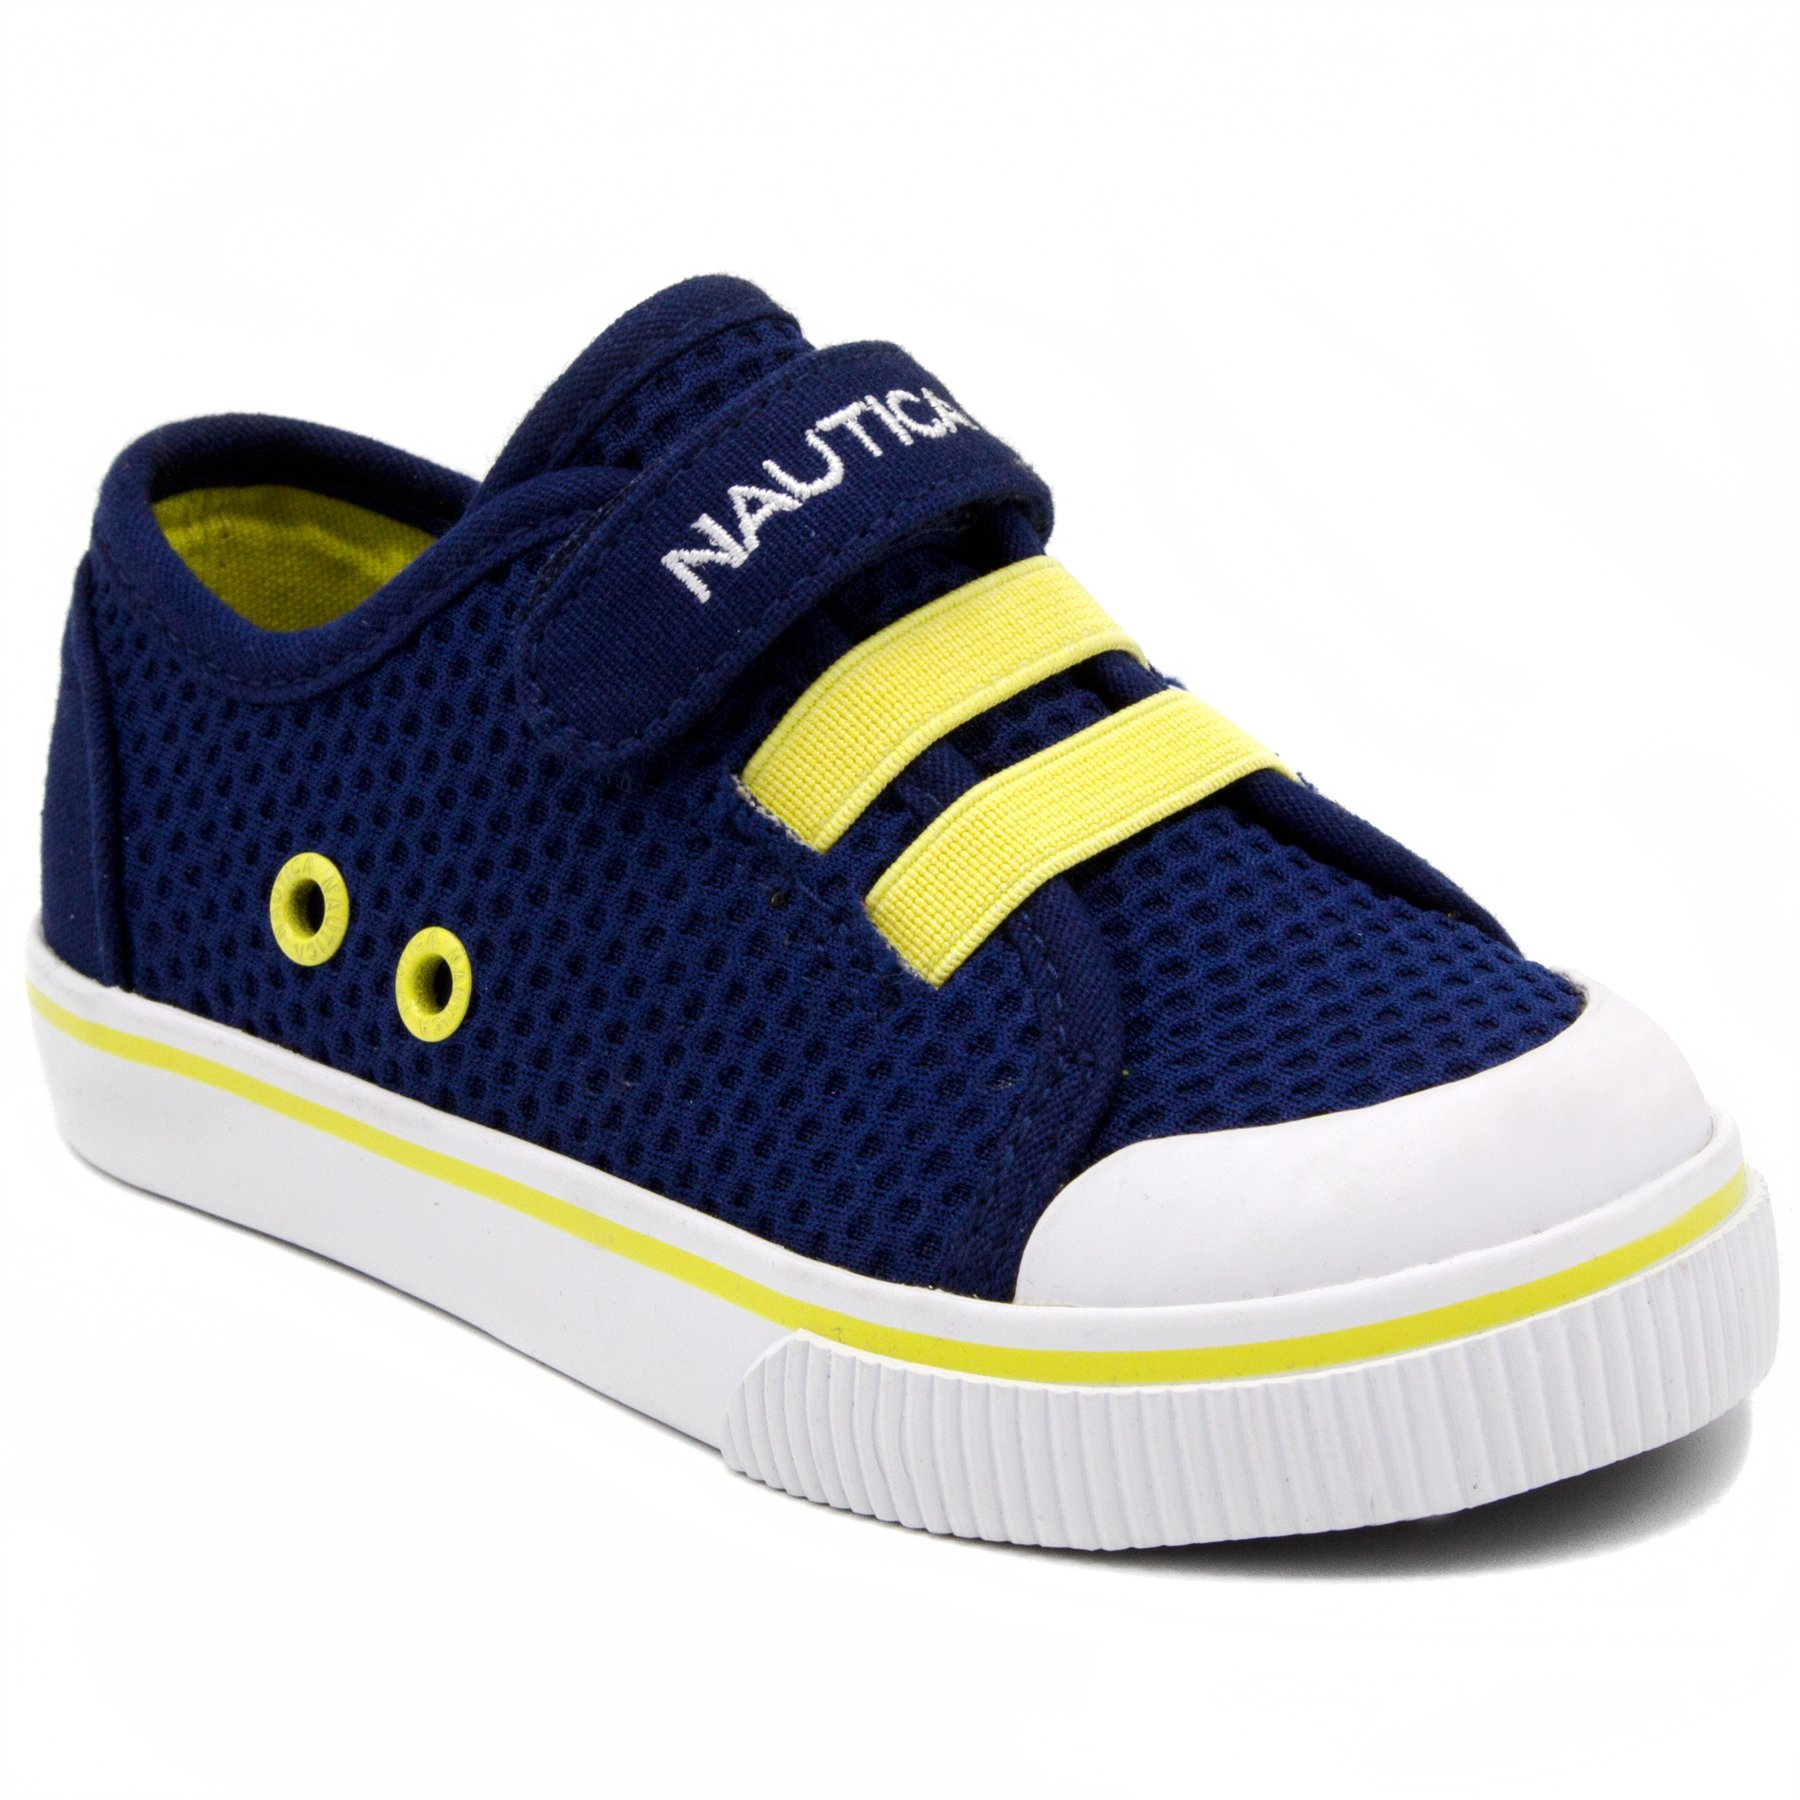 Nautica Kids Calloway Sneakers Bungee